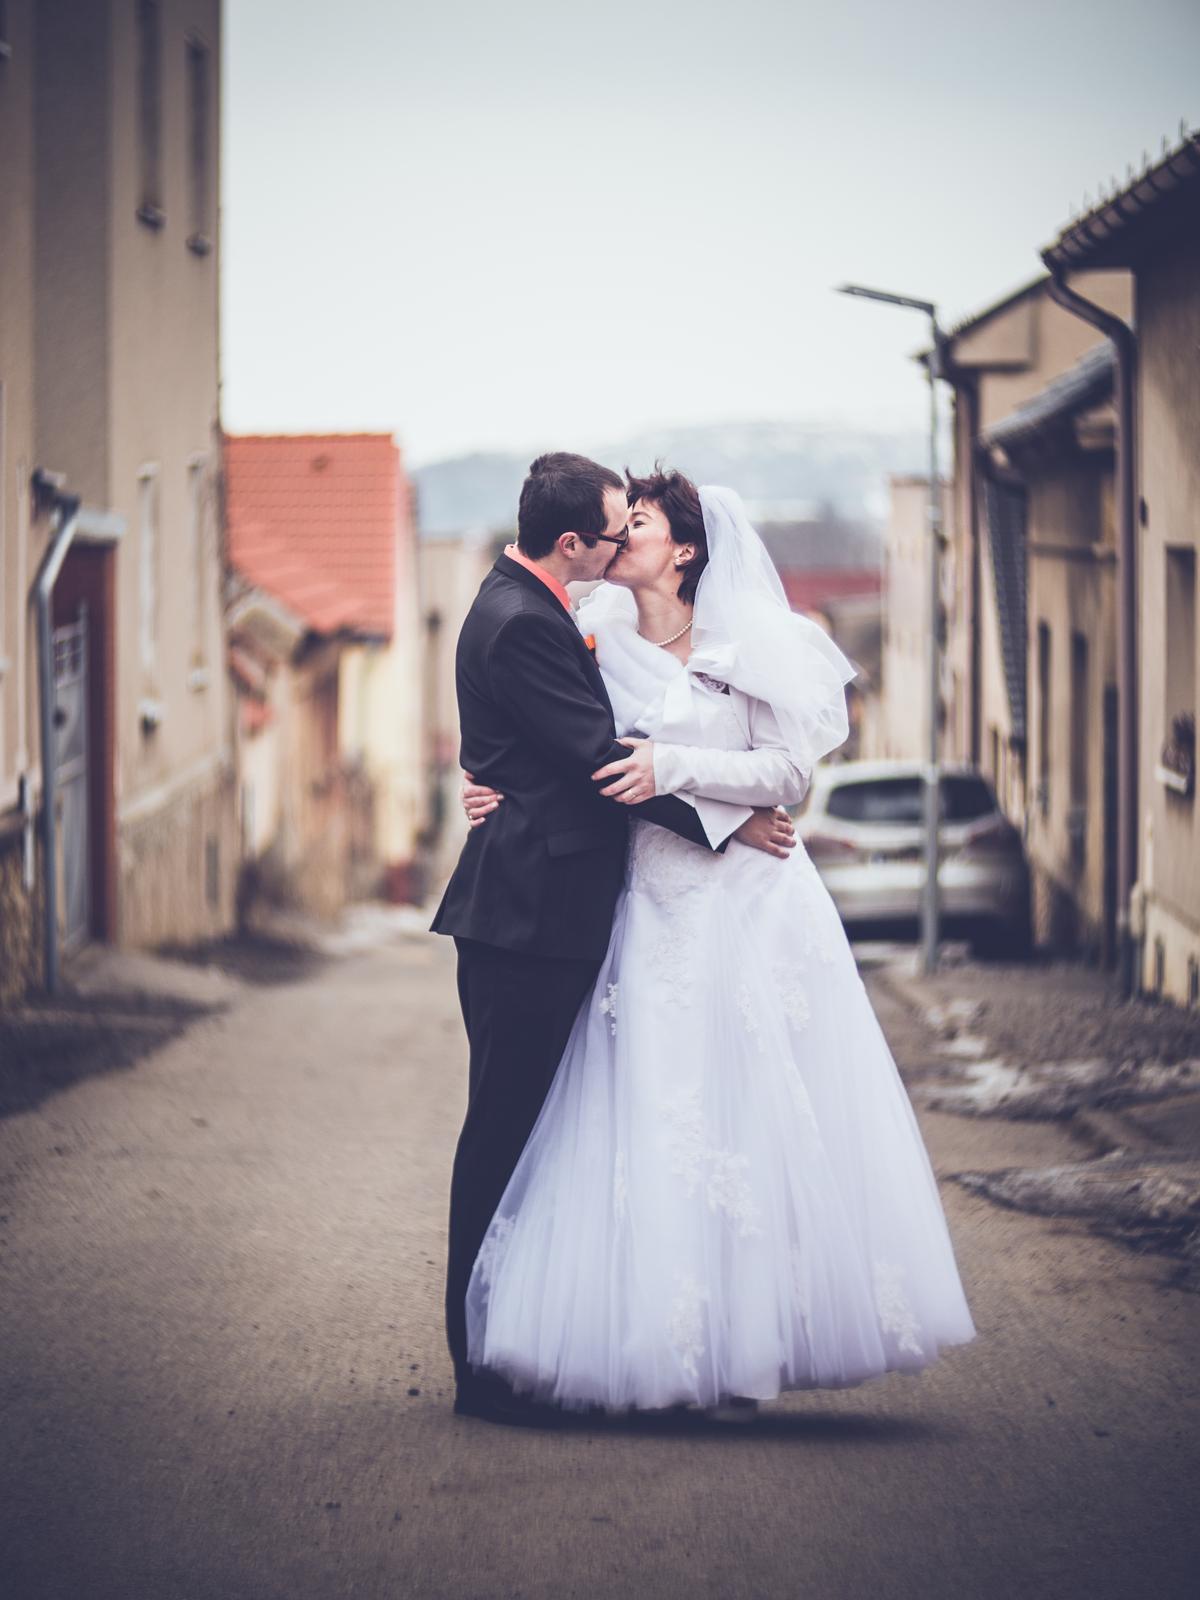 Svatba Jana&Michal - Obrázek č. 6